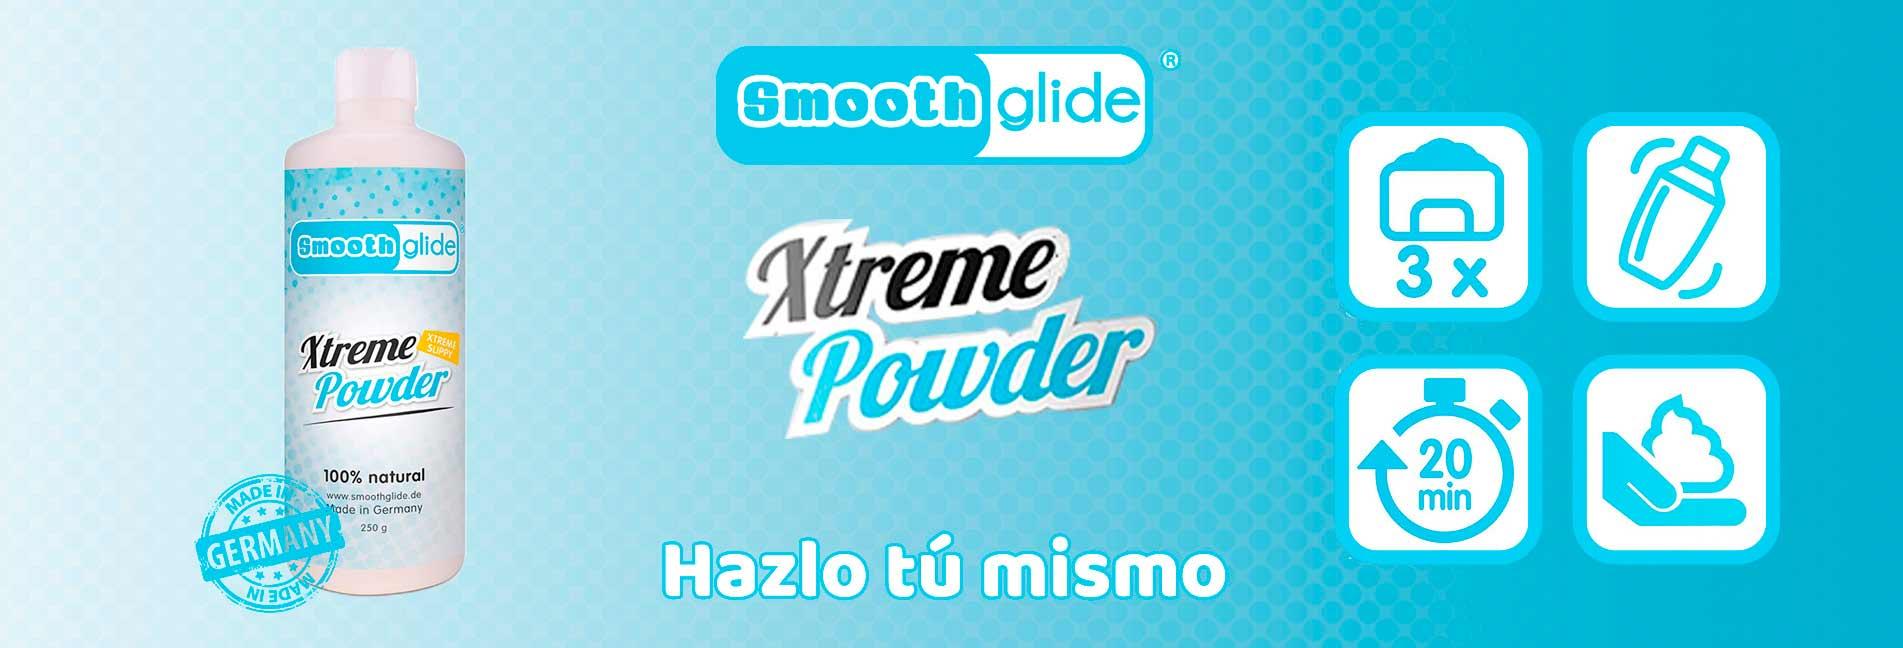 Smooth_Glide